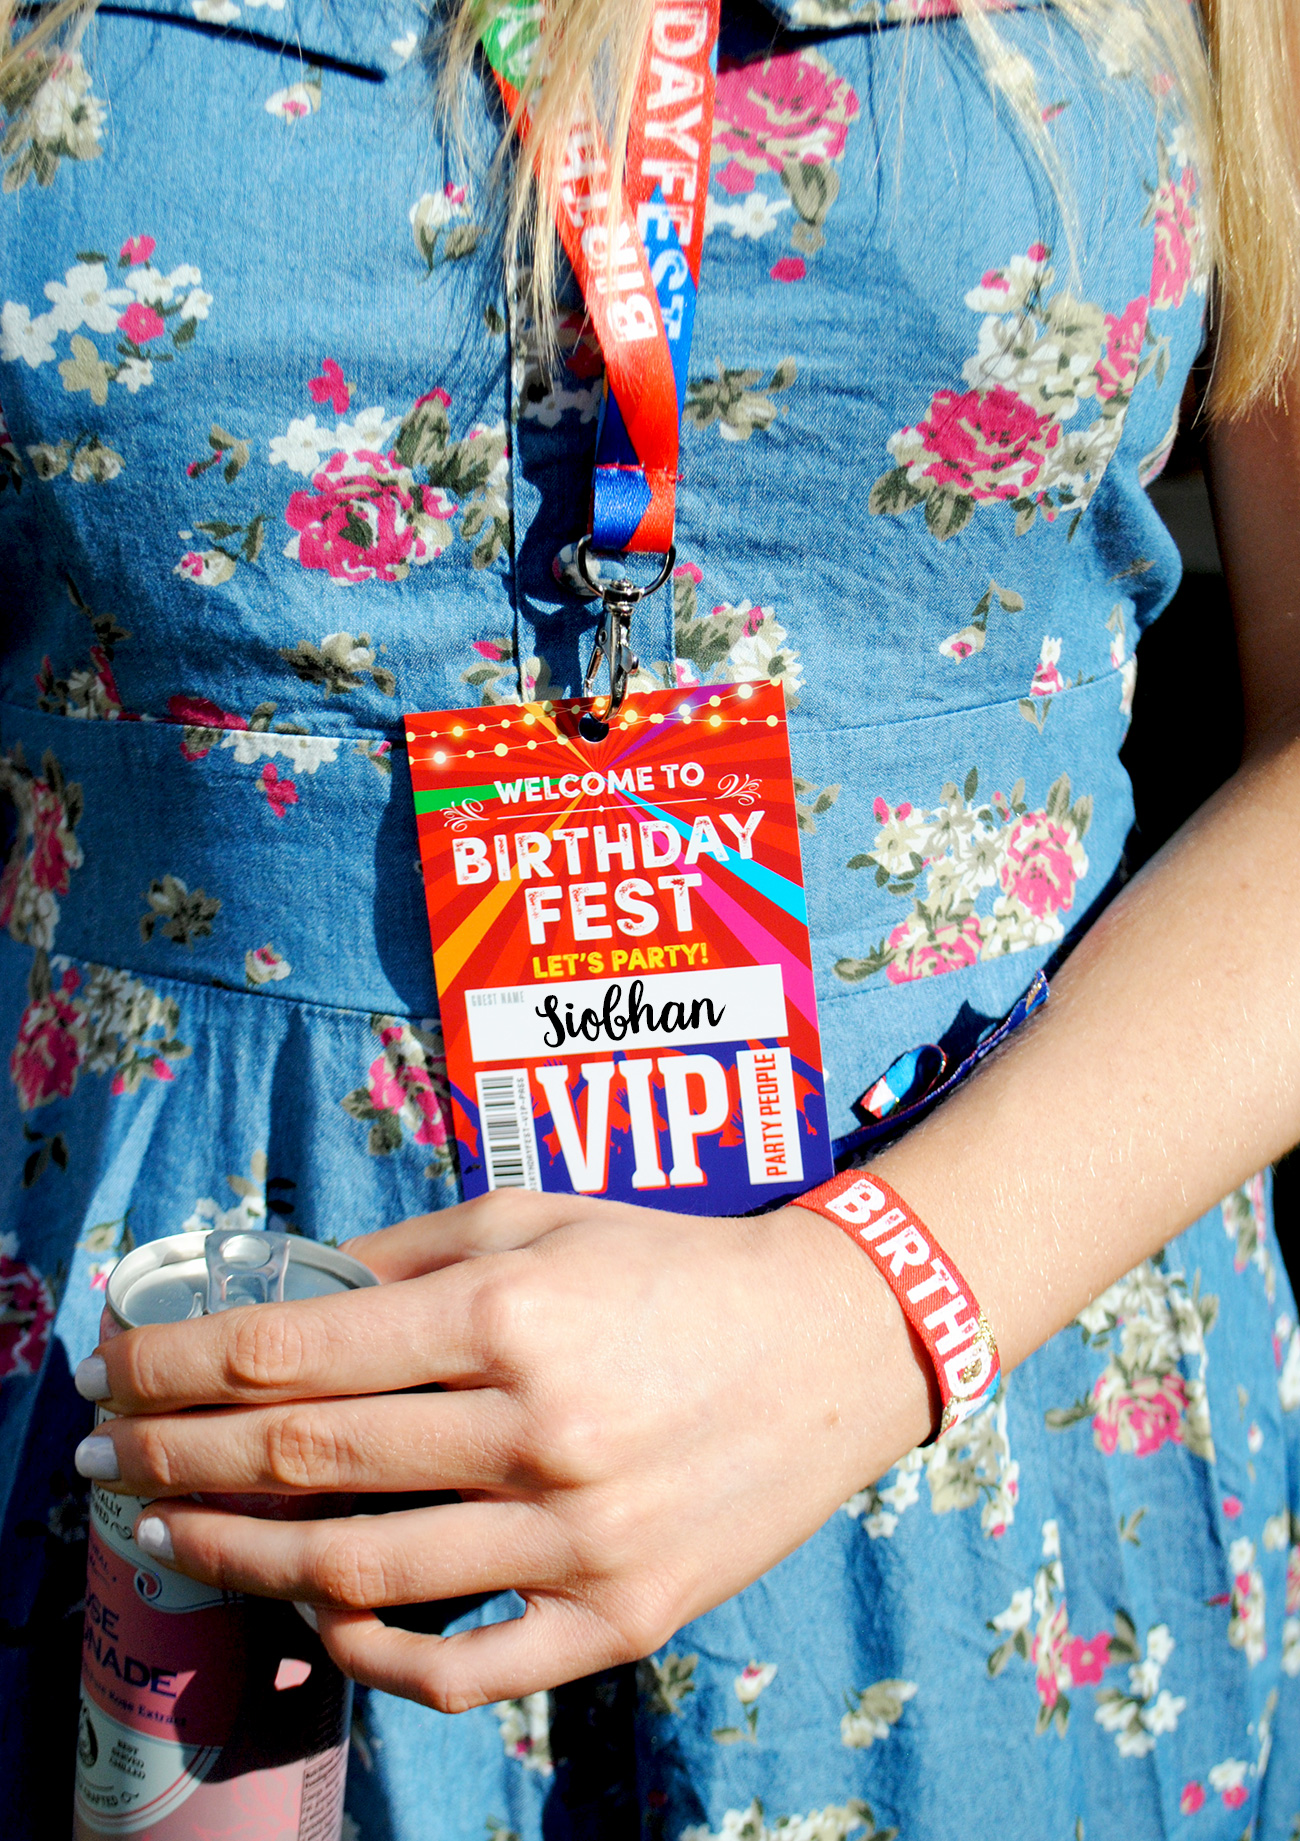 birthdayfest birthday party vip pass lanyards wristbands